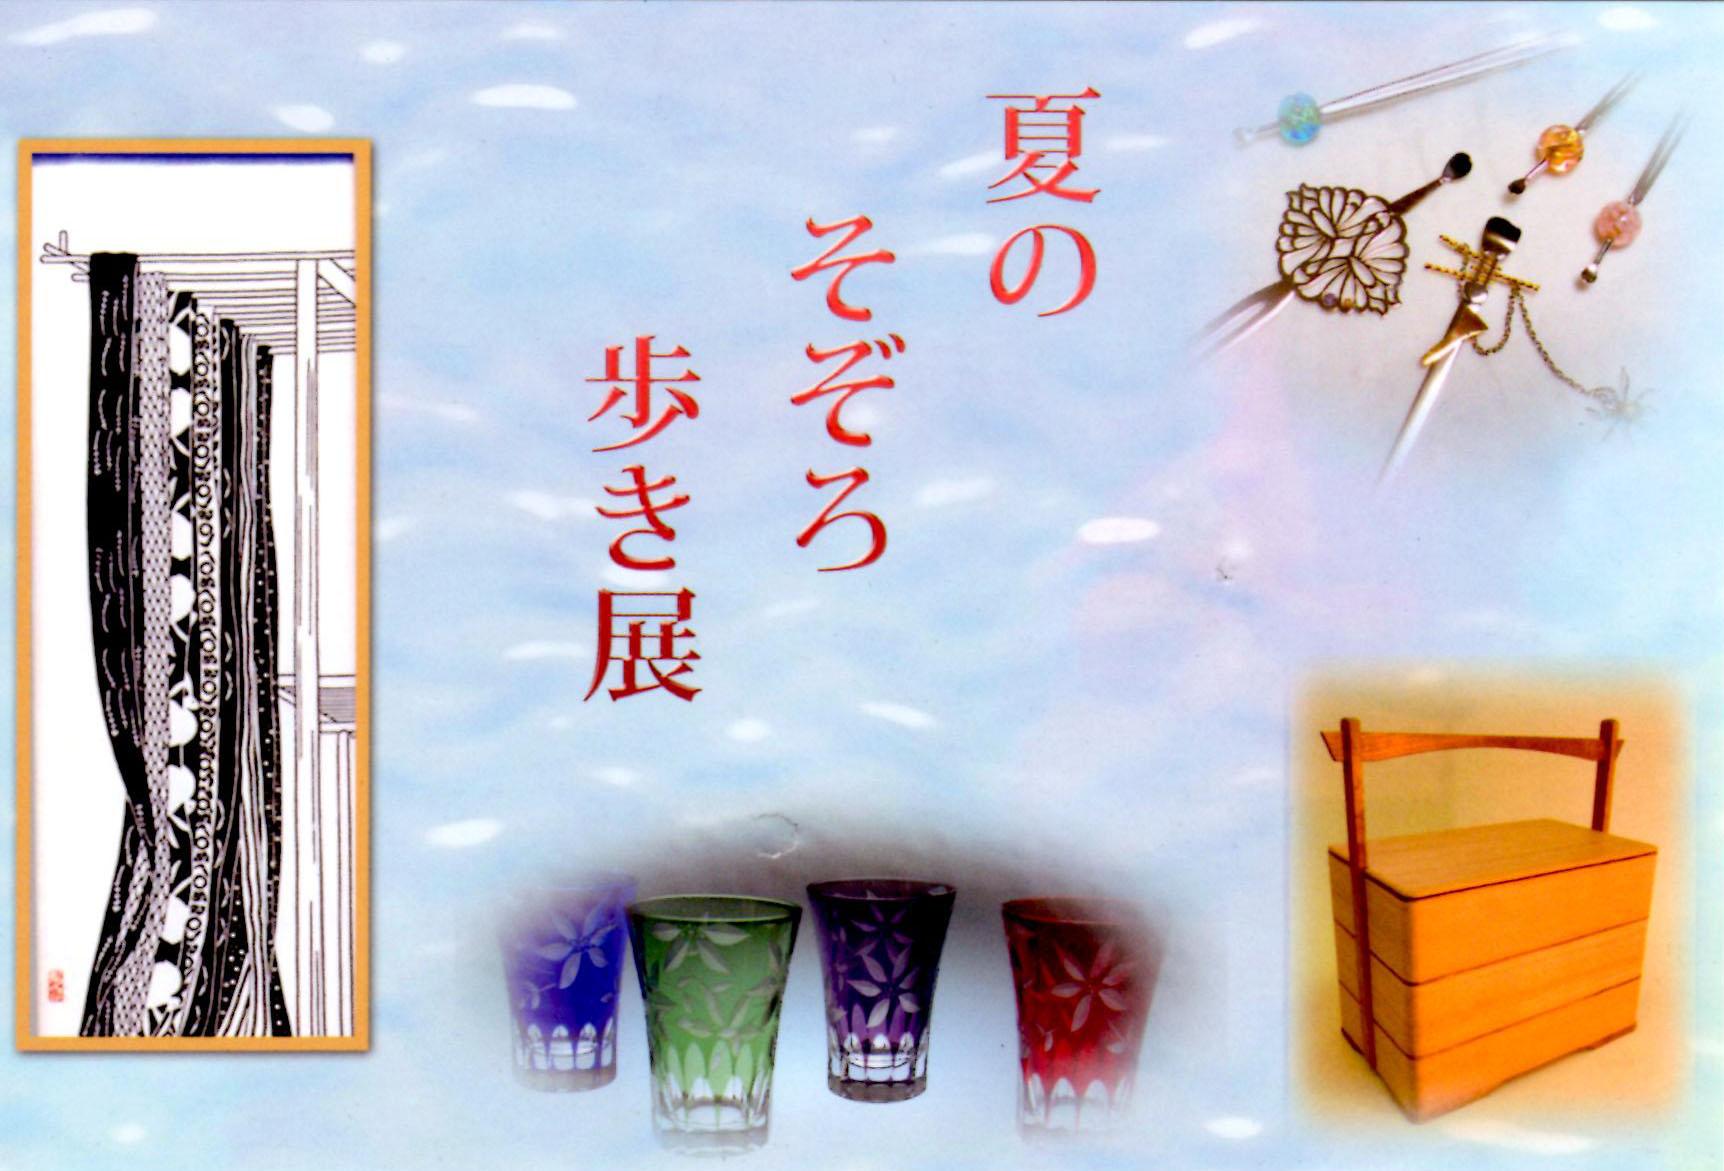 弟子の展示会_e0271858_636152.jpg